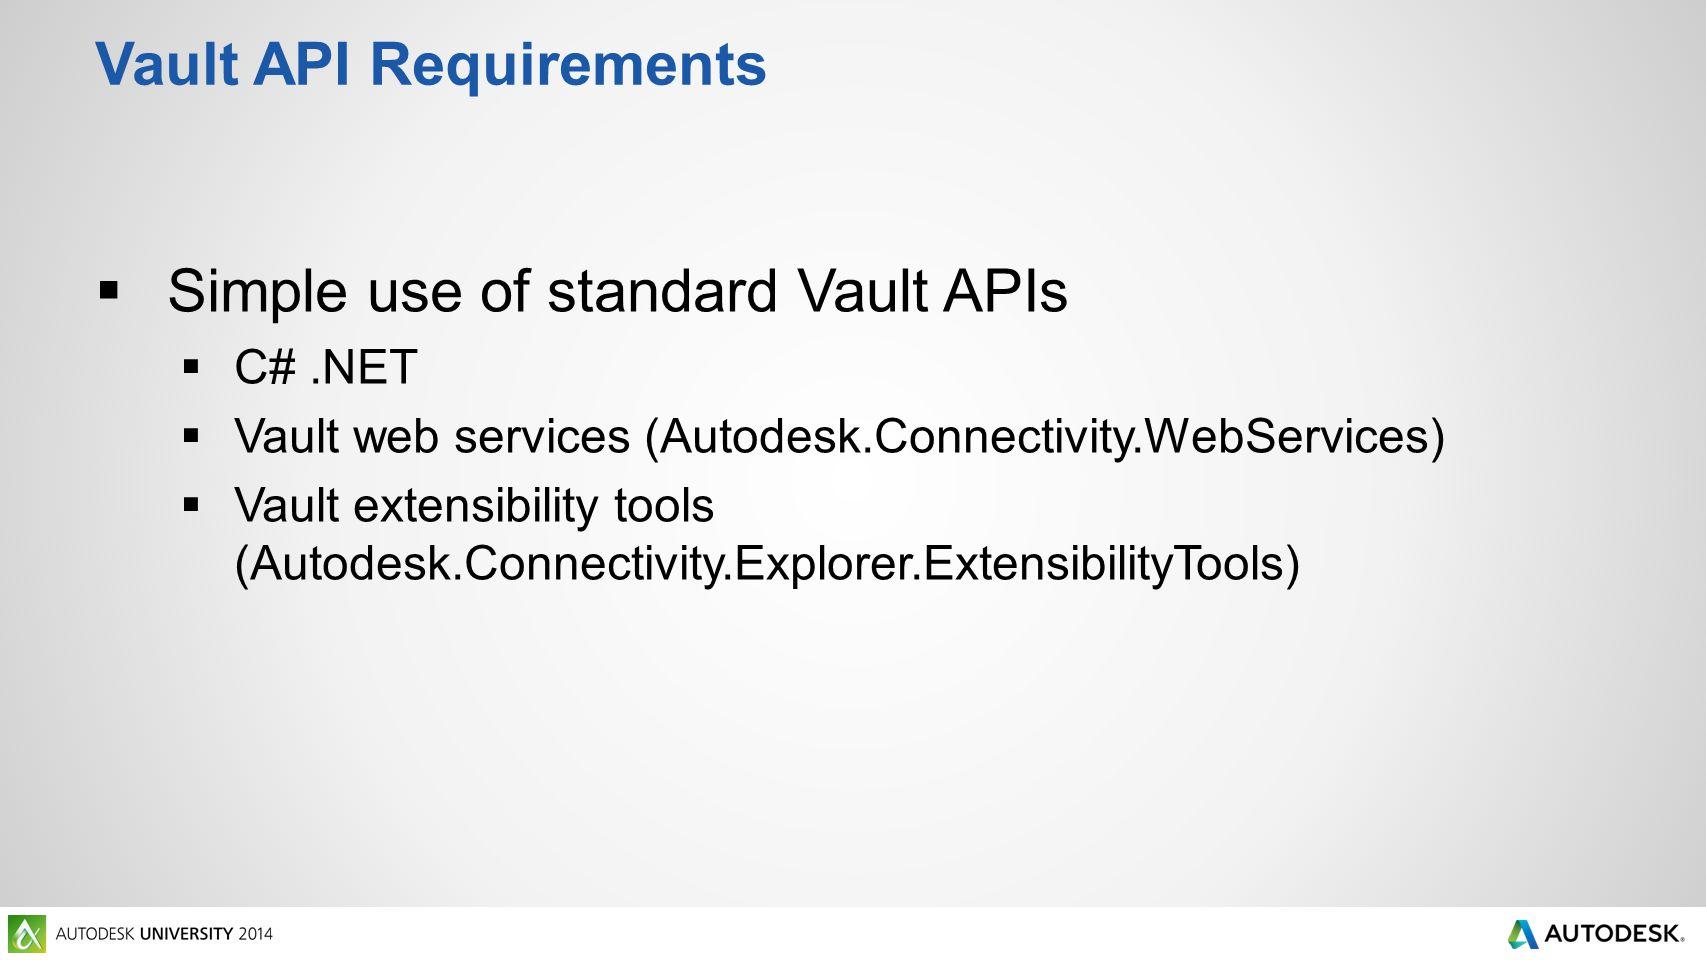 Vault API Requirements  Simple use of standard Vault APIs  C#.NET  Vault web services (Autodesk.Connectivity.WebServices)  Vault extensibility too